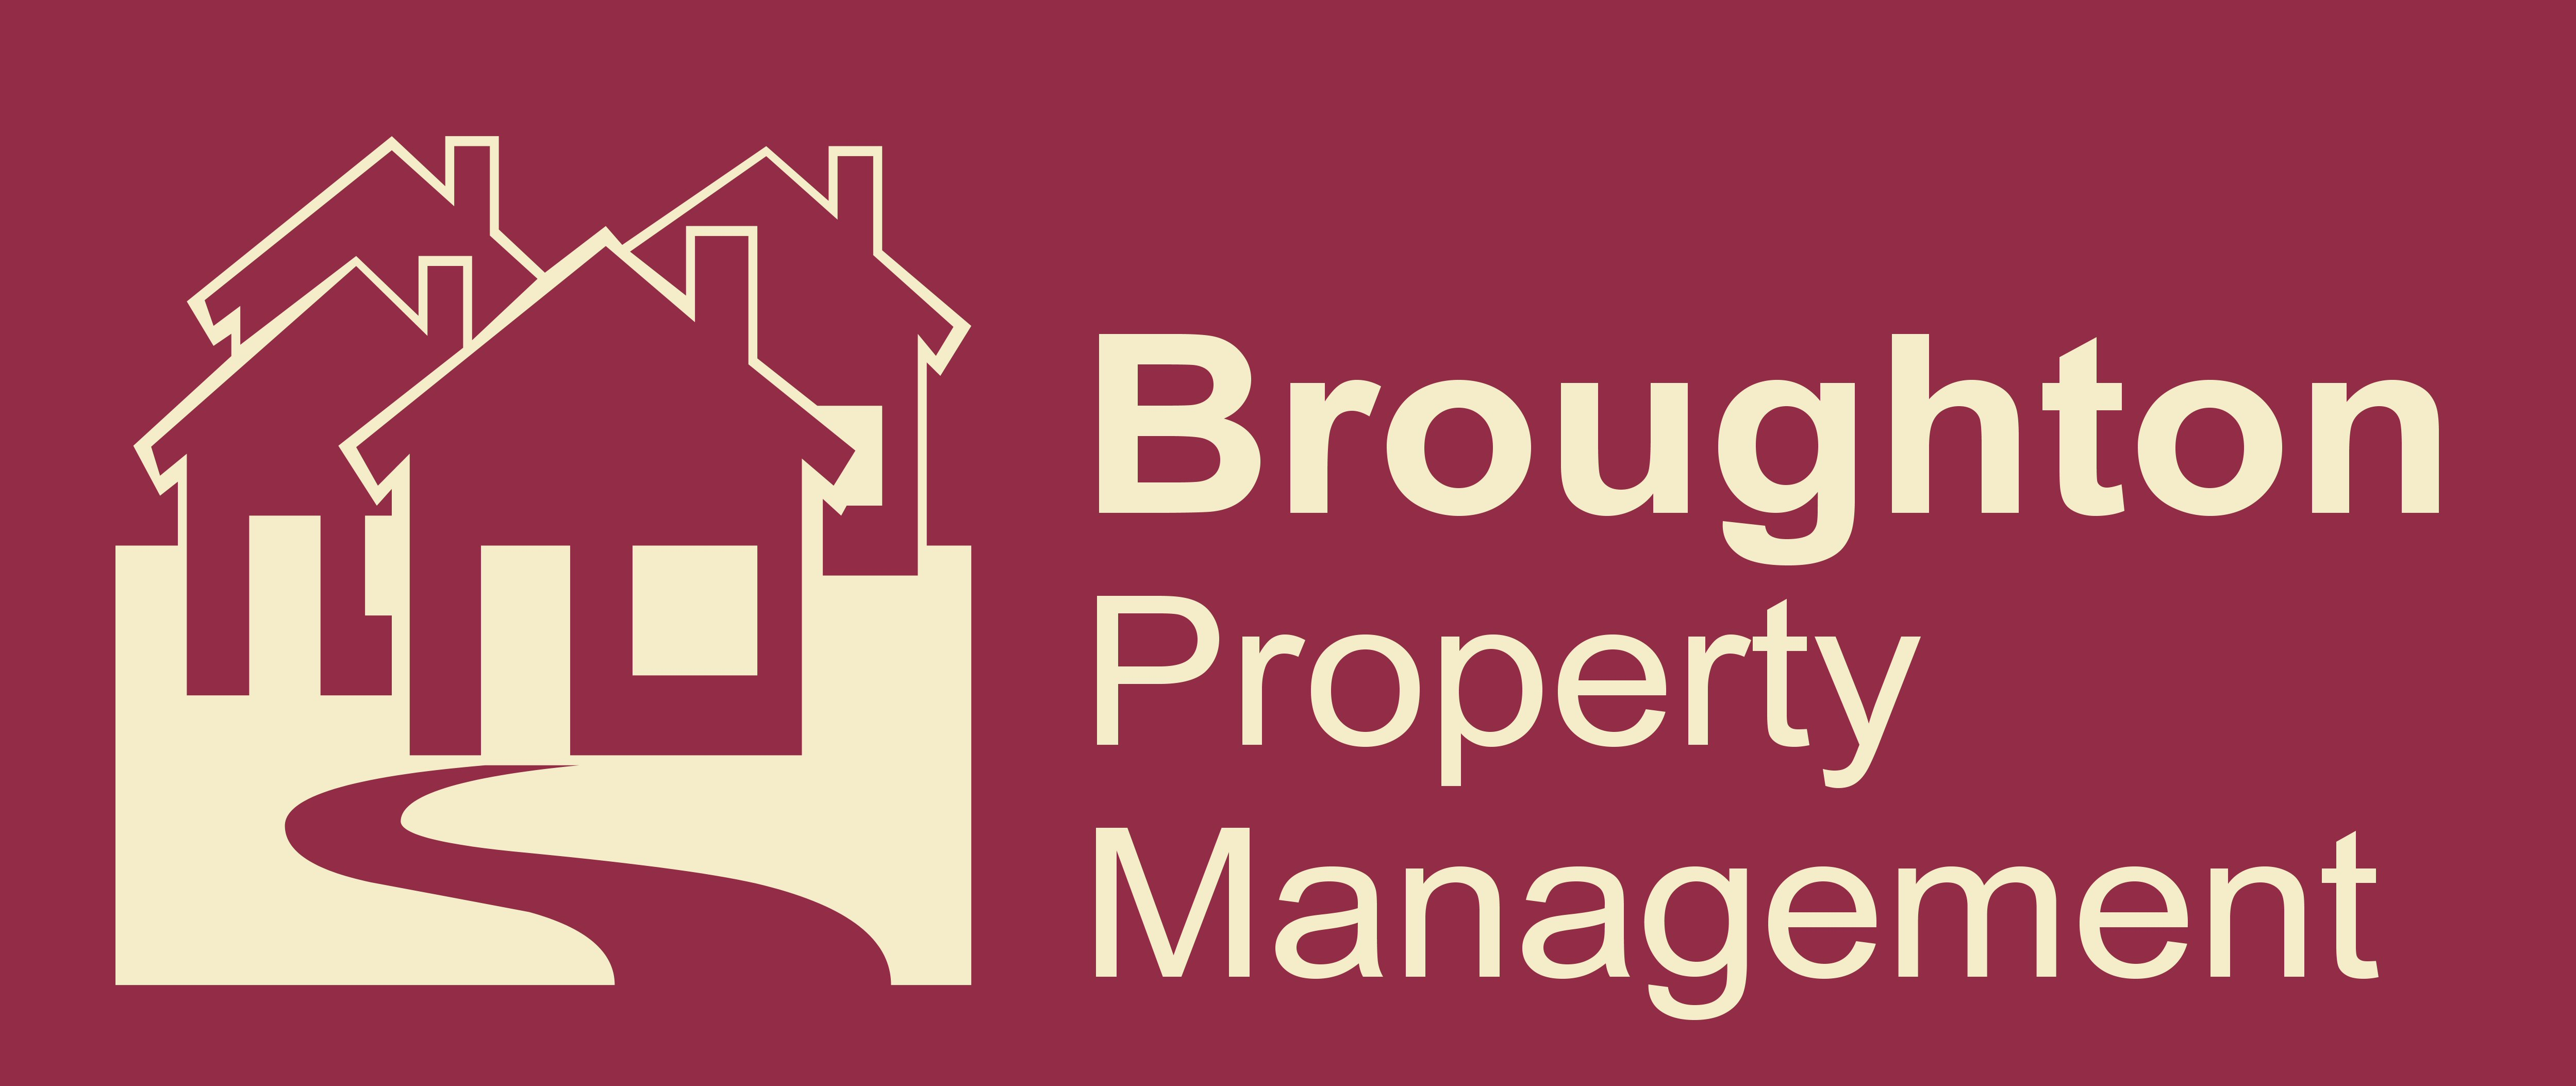 Broughton Property Management